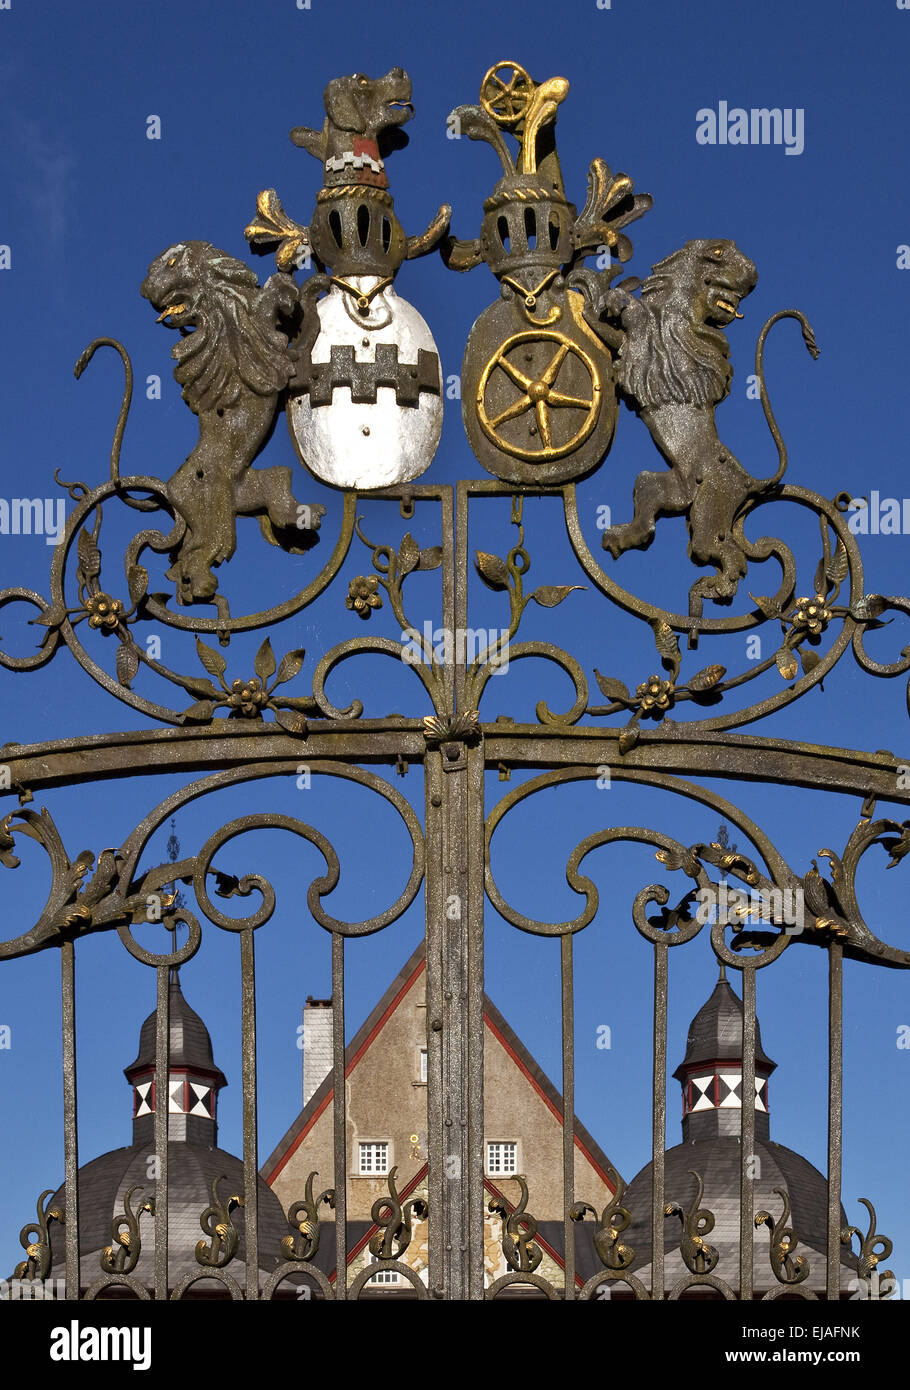 Eingangstor, Schloss Neuenhof, Lüdenscheid Stockbild